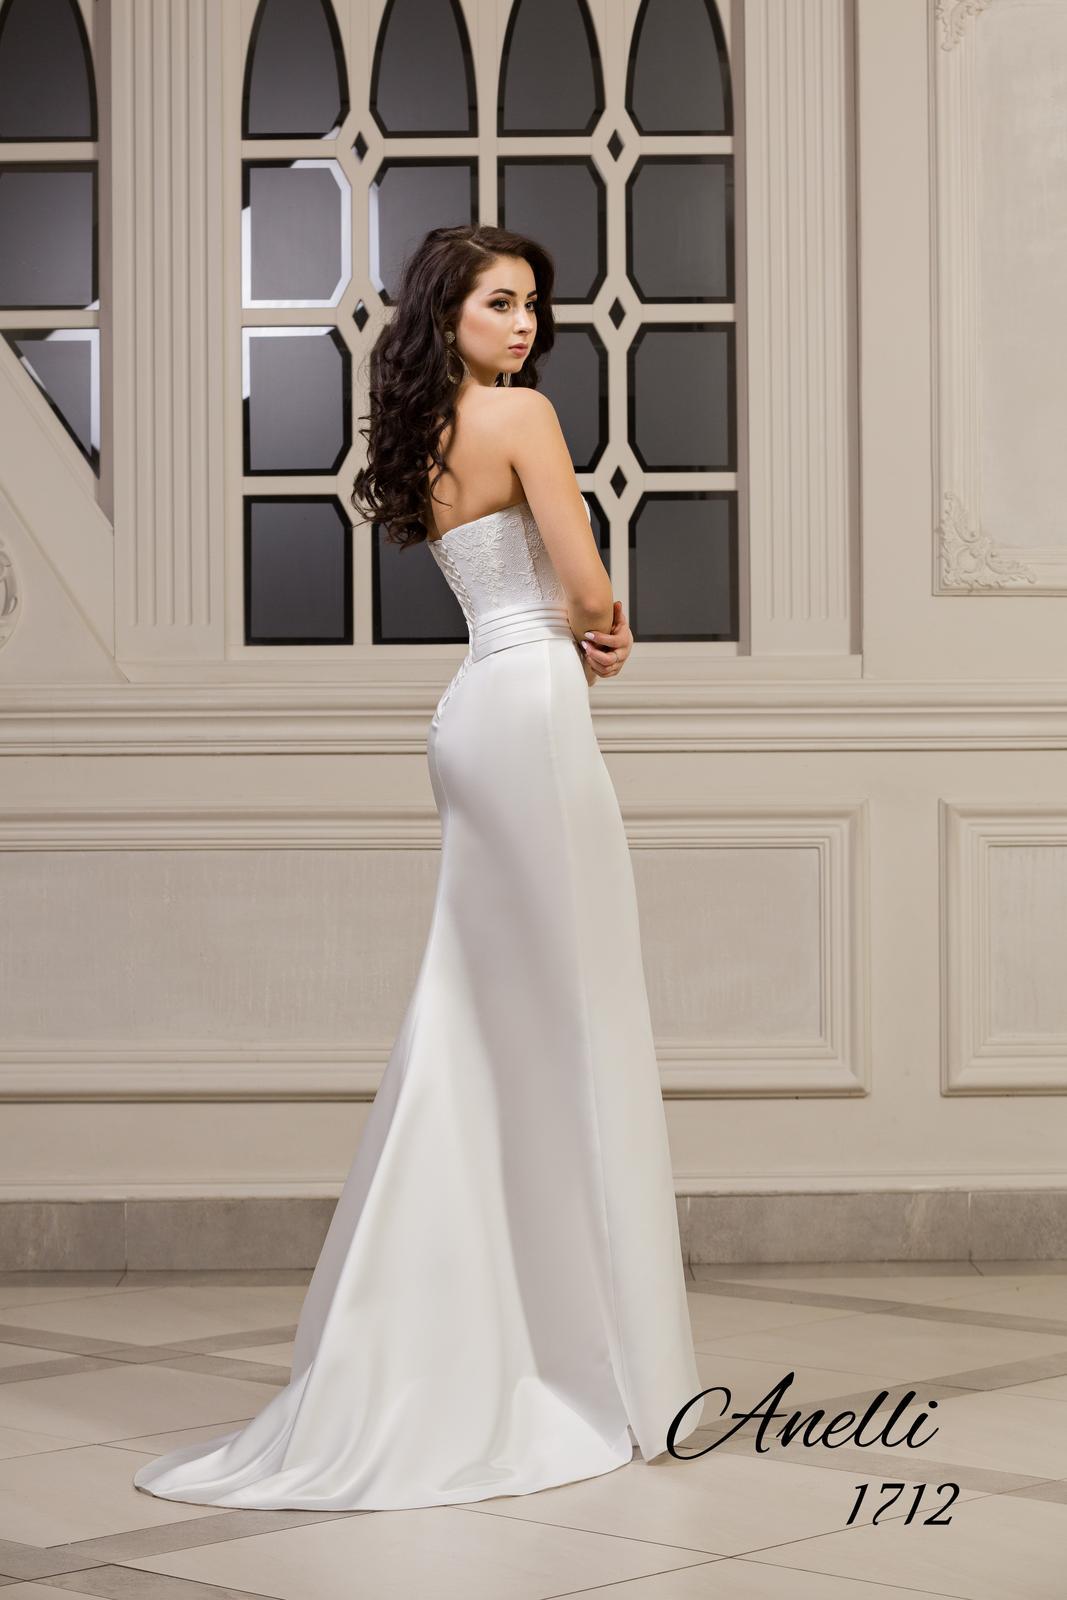 Svadobné šaty - Debut 1712 - Obrázok č. 3